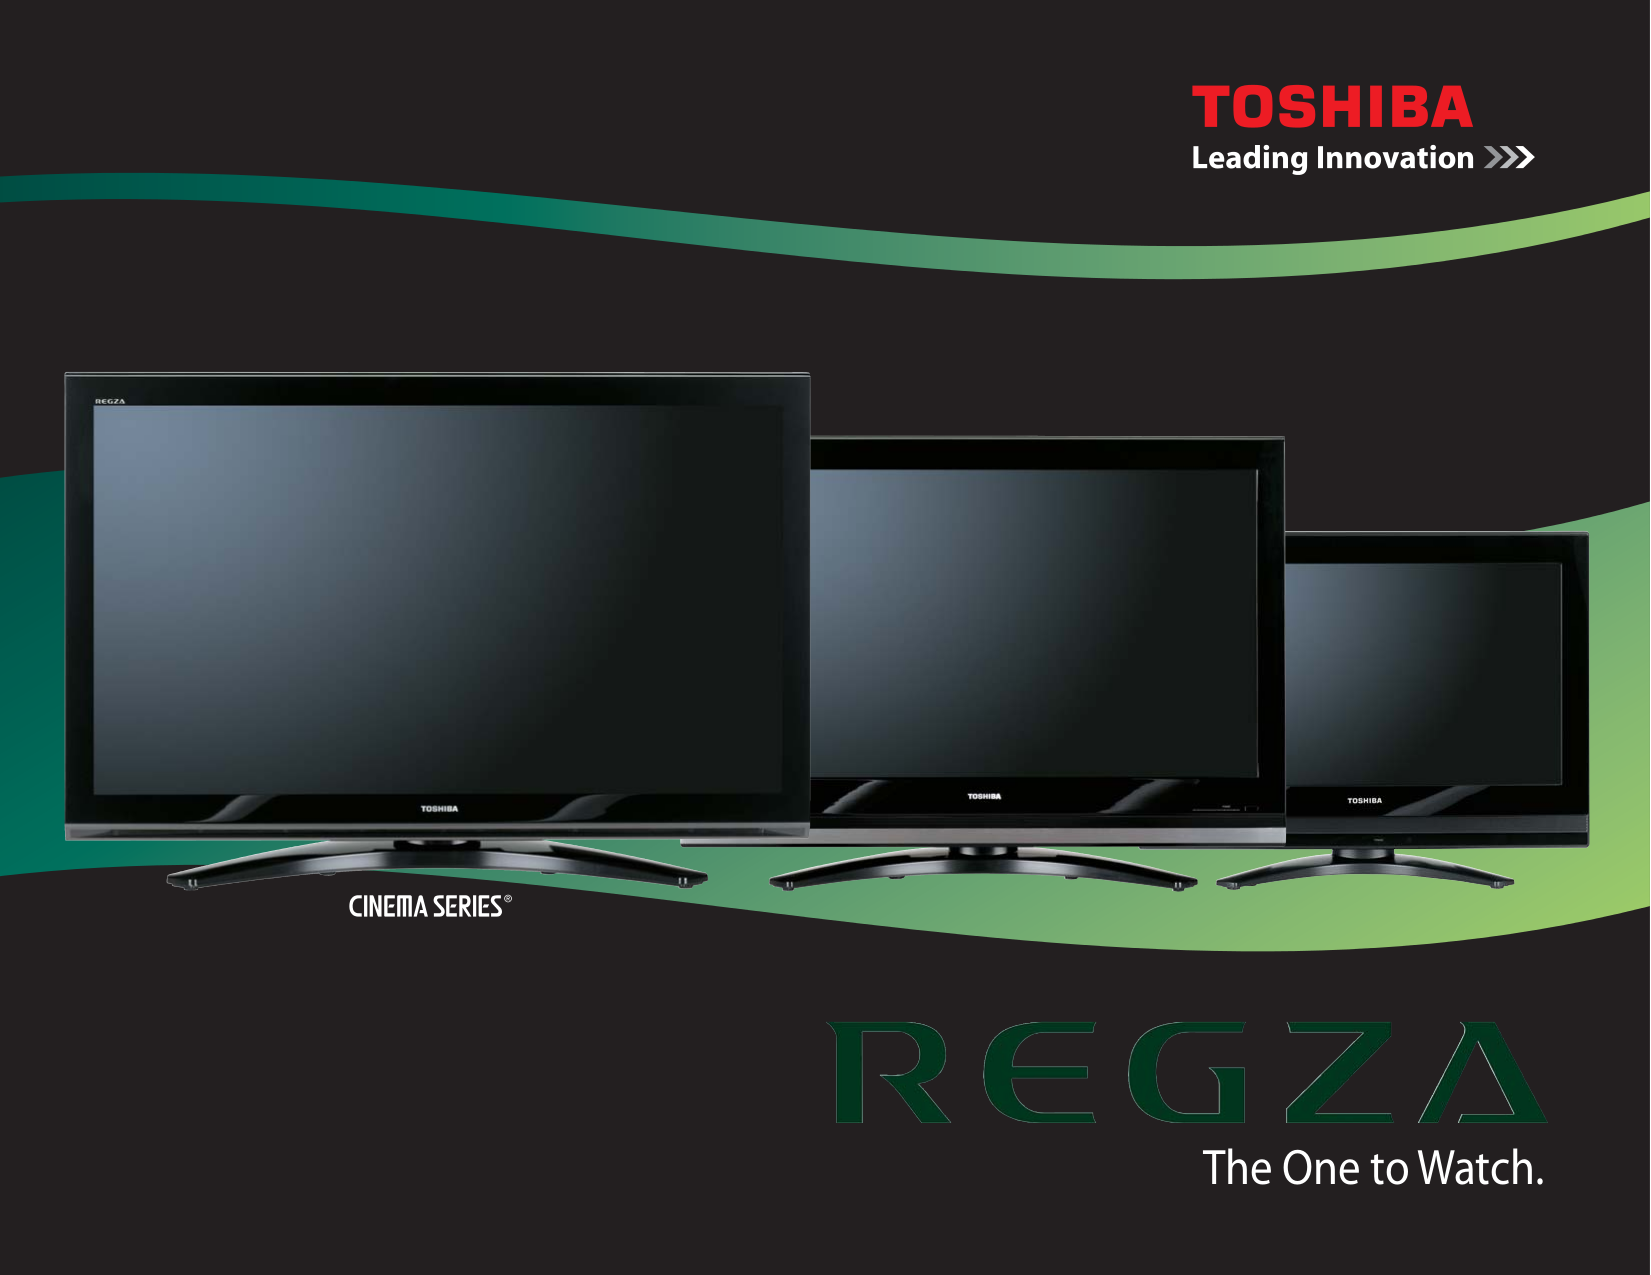 download free pdf for toshiba regza 42lx177 tv manual rh umlib com Toshiba Cinema Series Manual Toshiba Flat Screen TV Manual